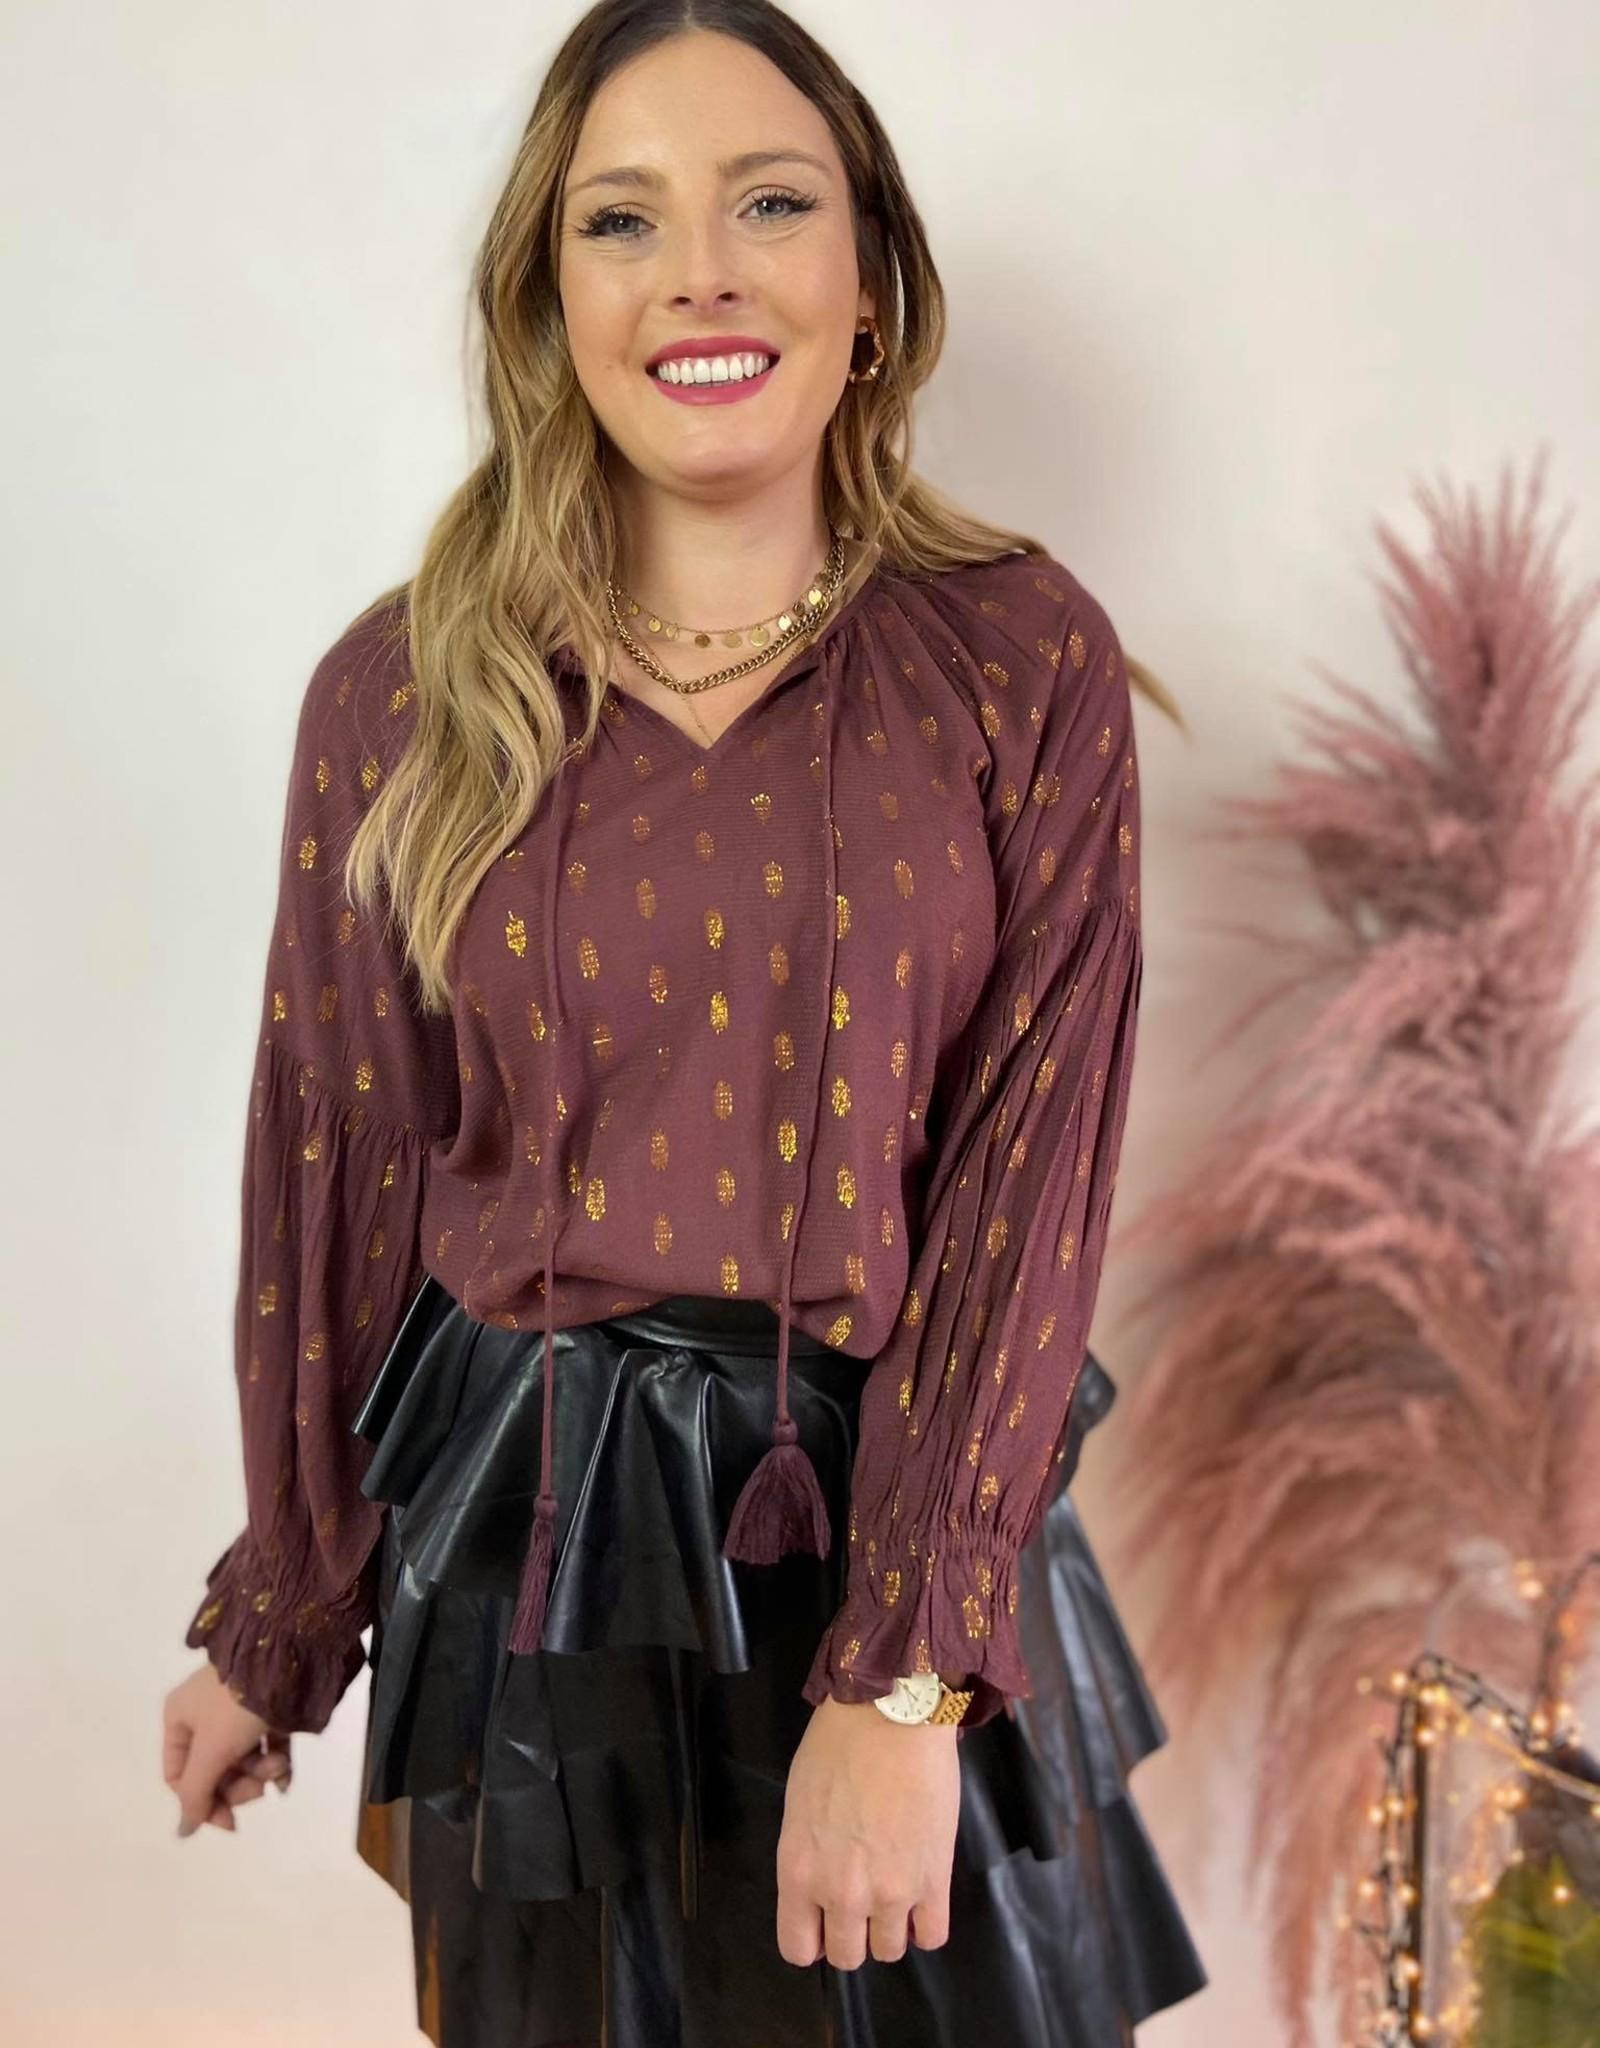 MaschaCR blouse decadent chocol